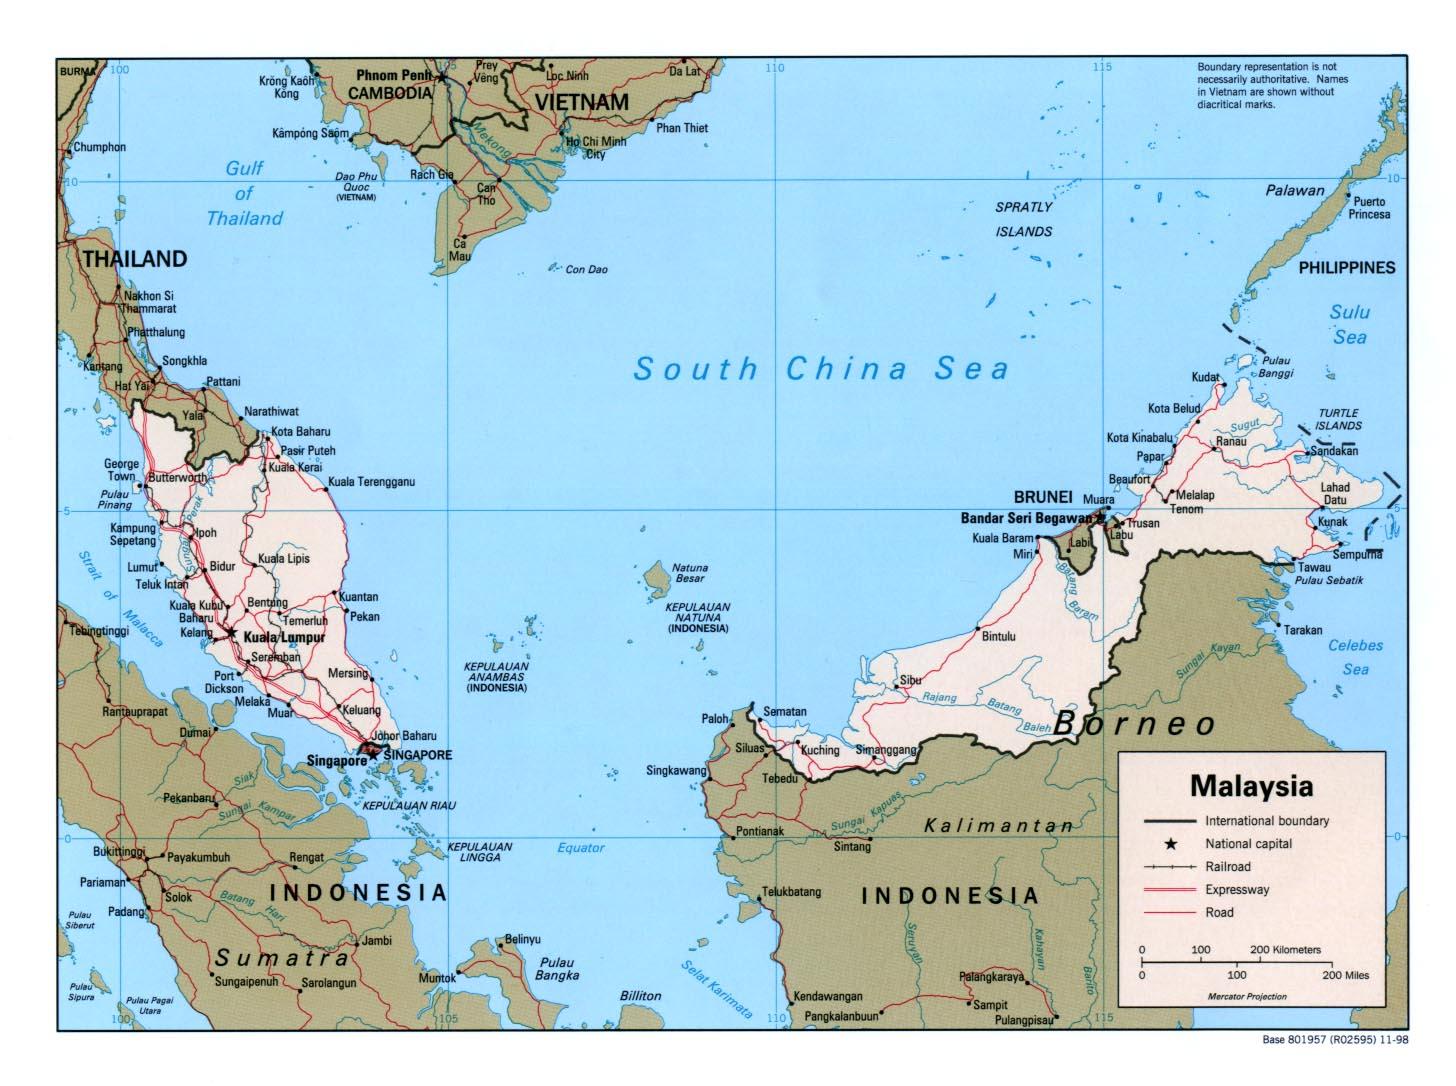 Map of Malaysia (Political Map) : Weltkarte.com - Karten und ...